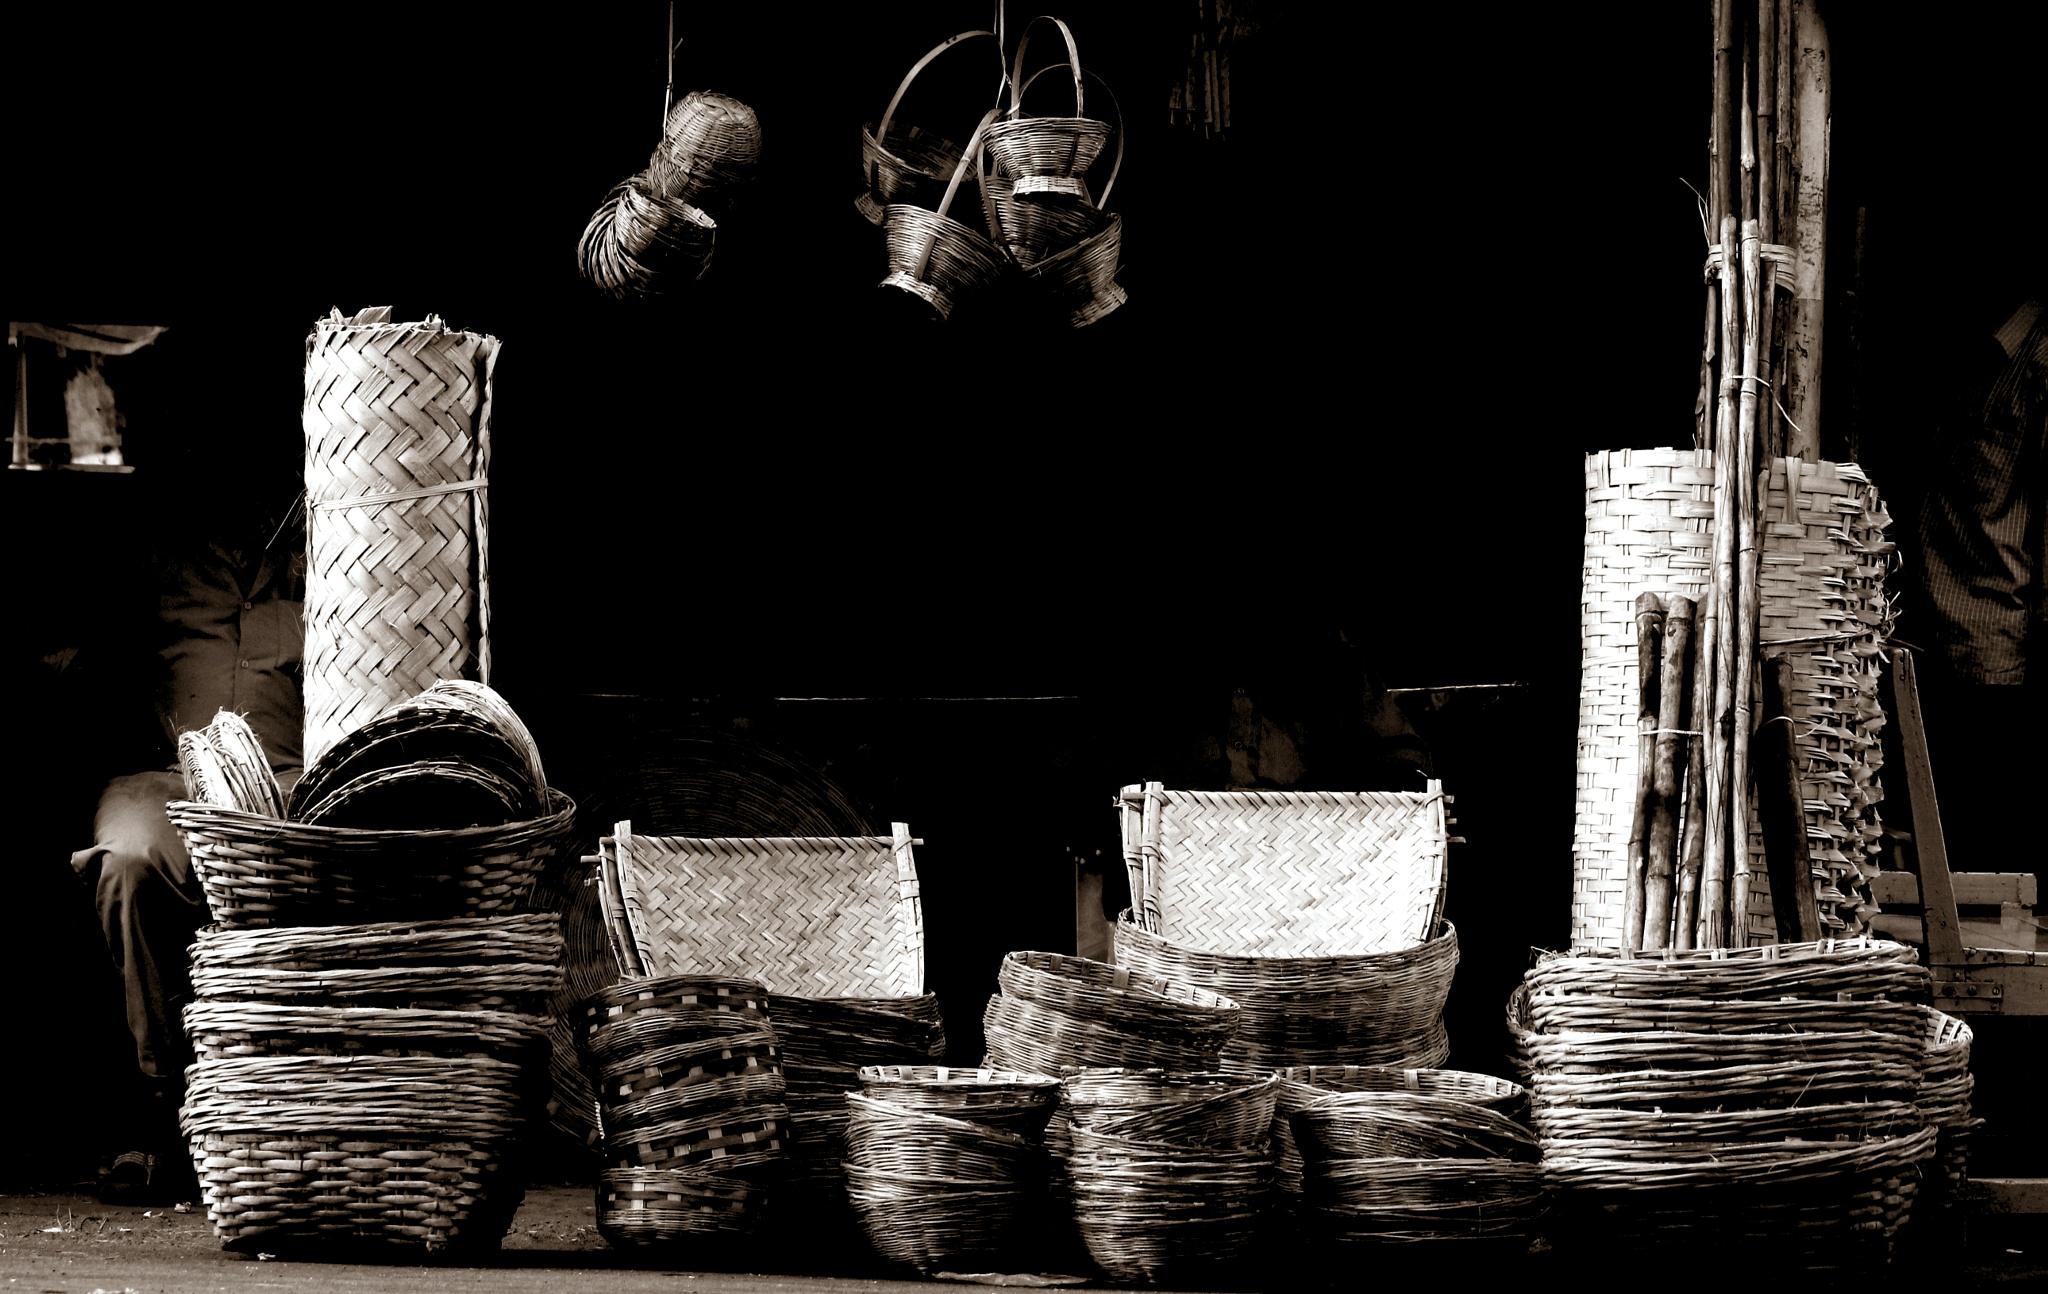 #bamboo world#monochrome by Prashik Waghmare